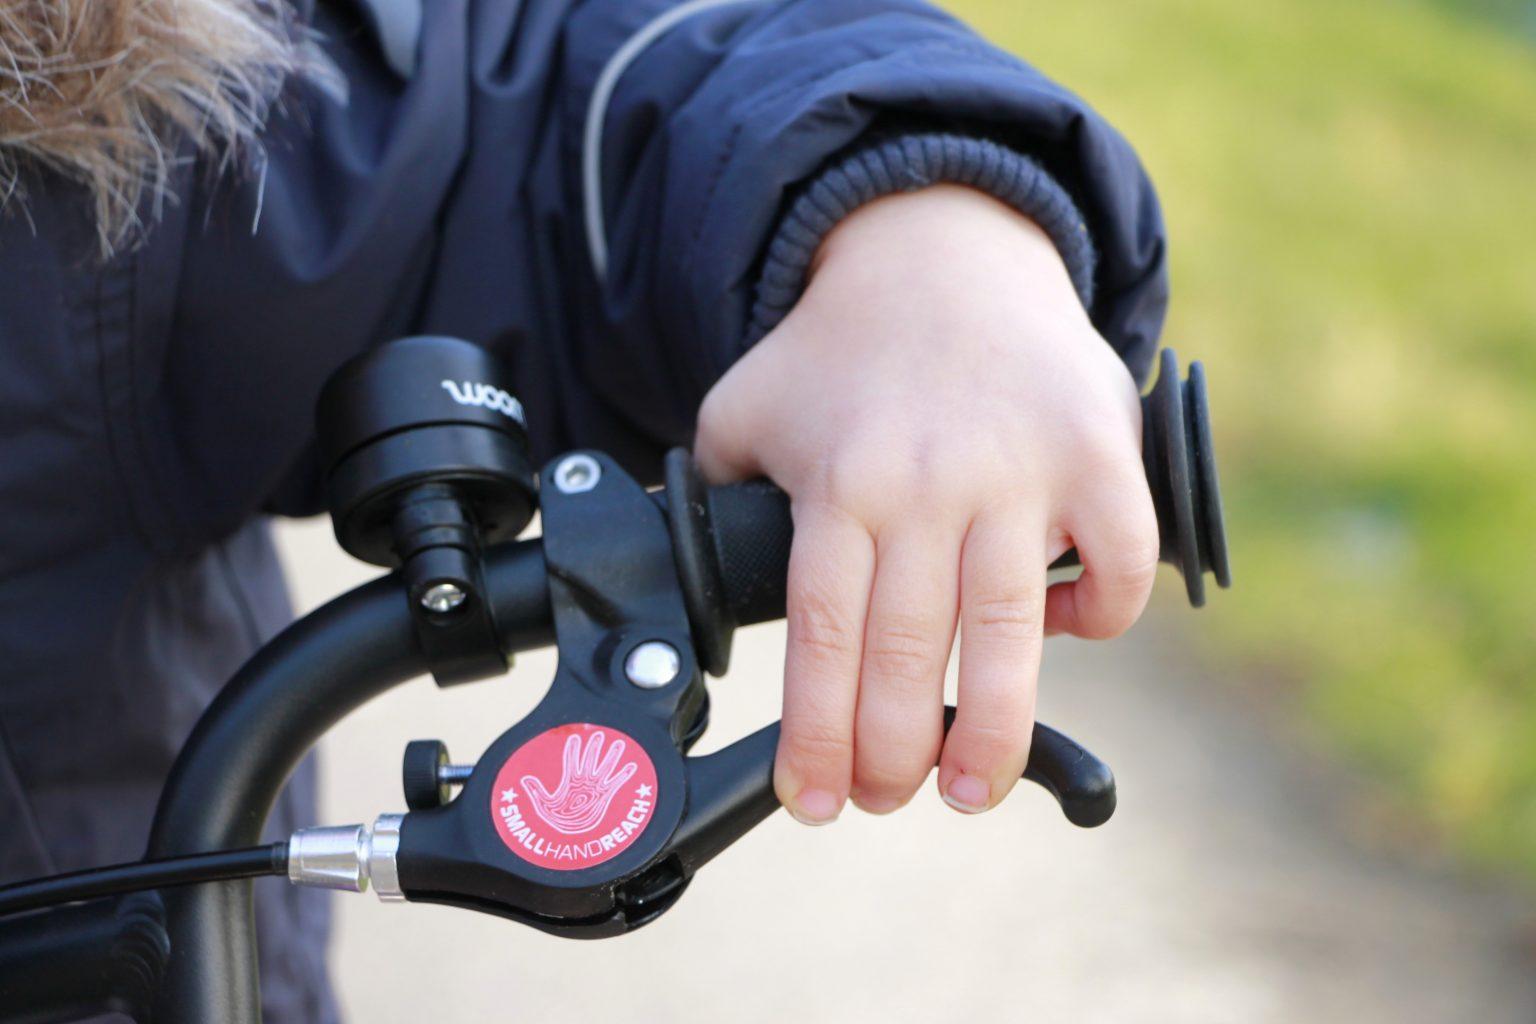 Kinderrad Kauf Tipps